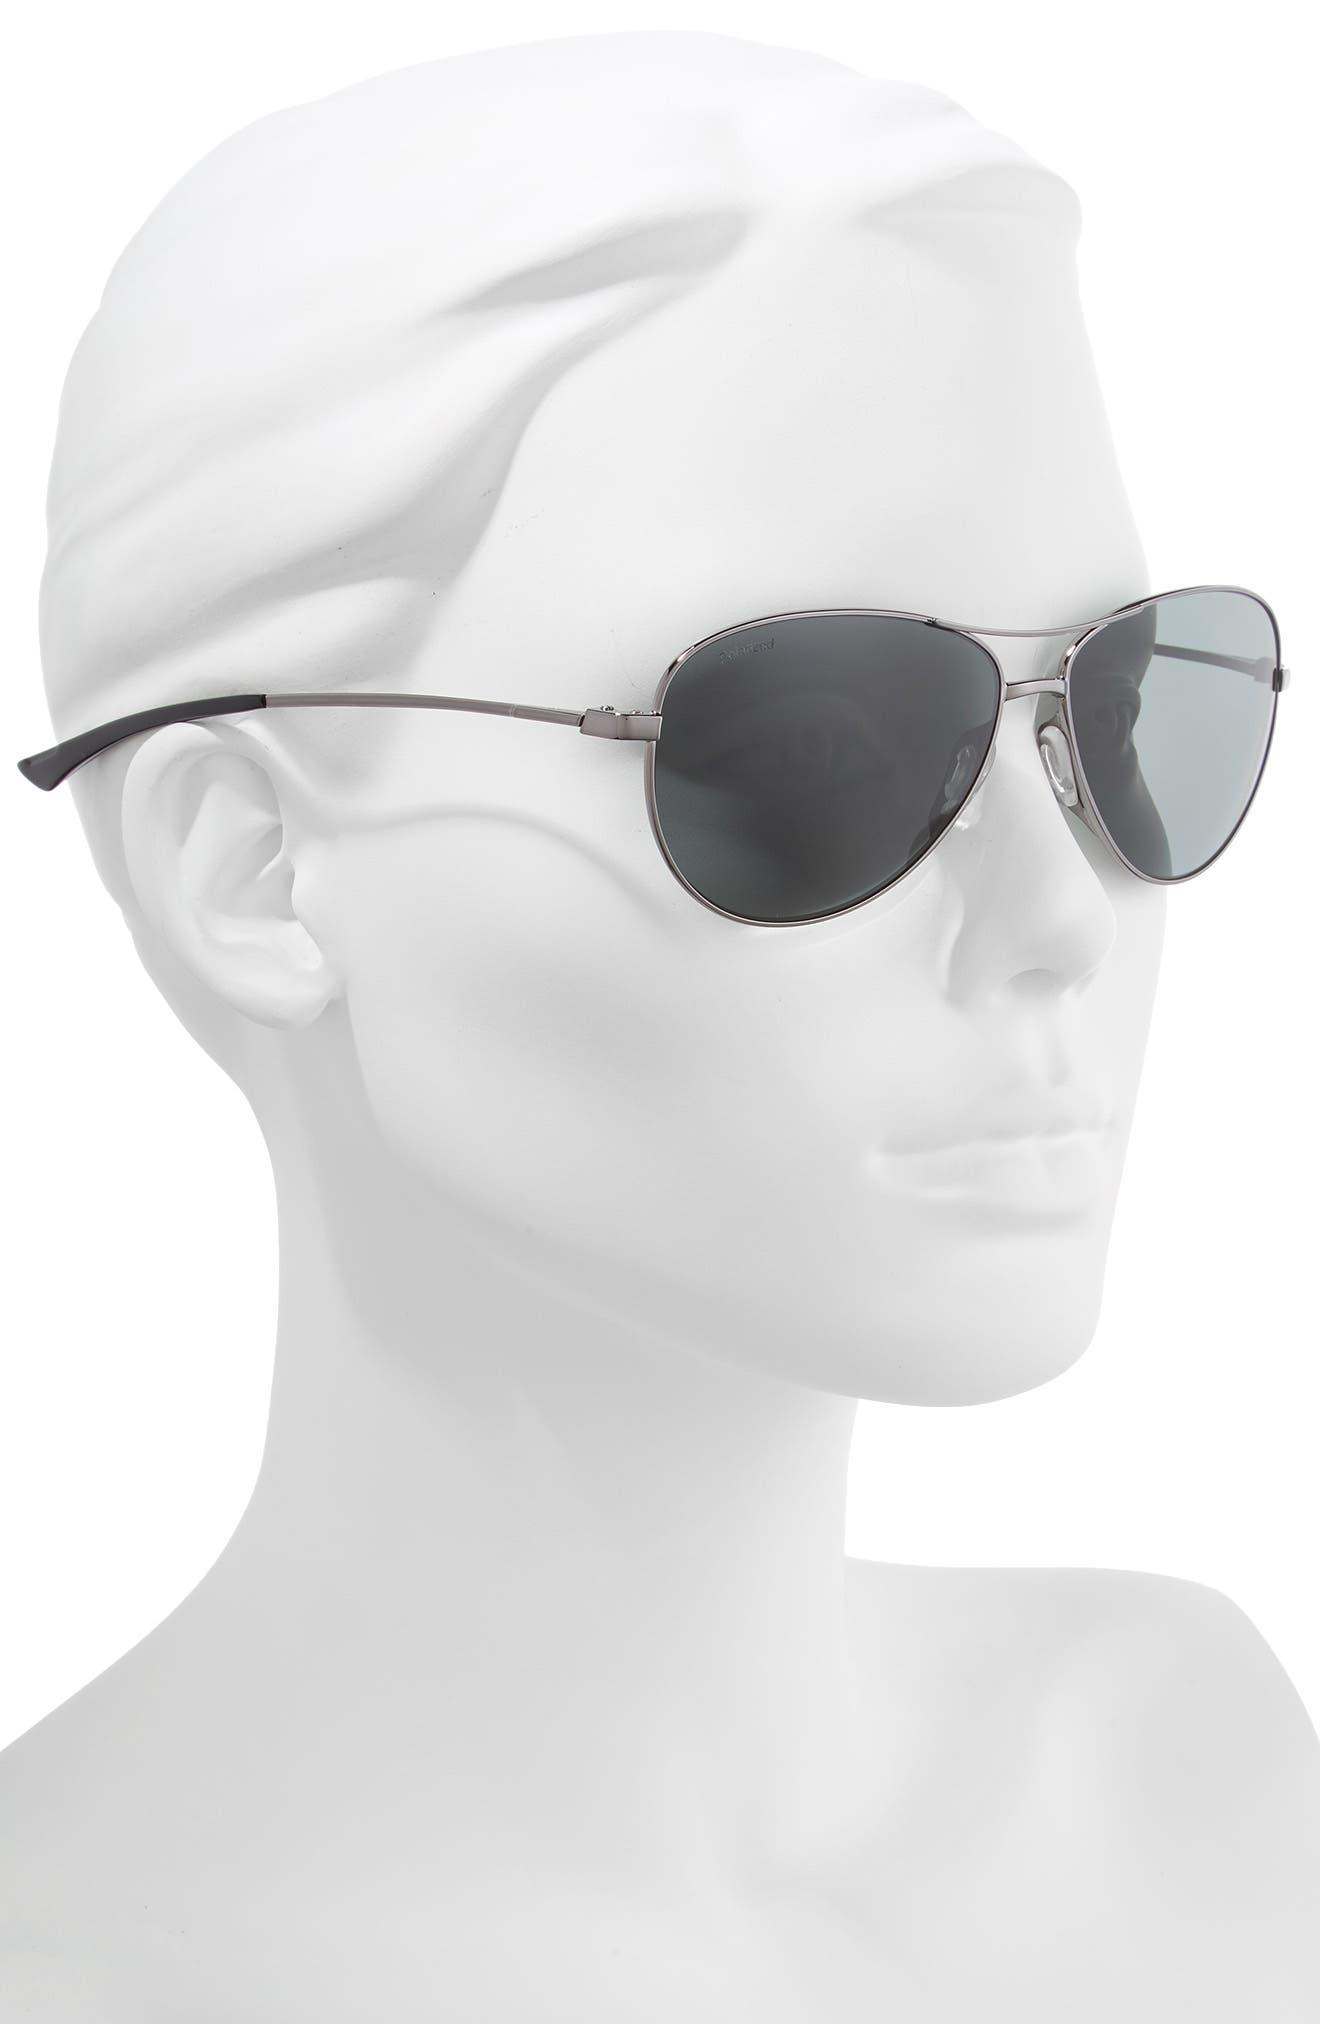 Langley 60mm ChromaPop<sup>™</sup> Polarized Aviator Sunglasses,                             Alternate thumbnail 2, color,                             DARK RUTHENIUM/ GREY